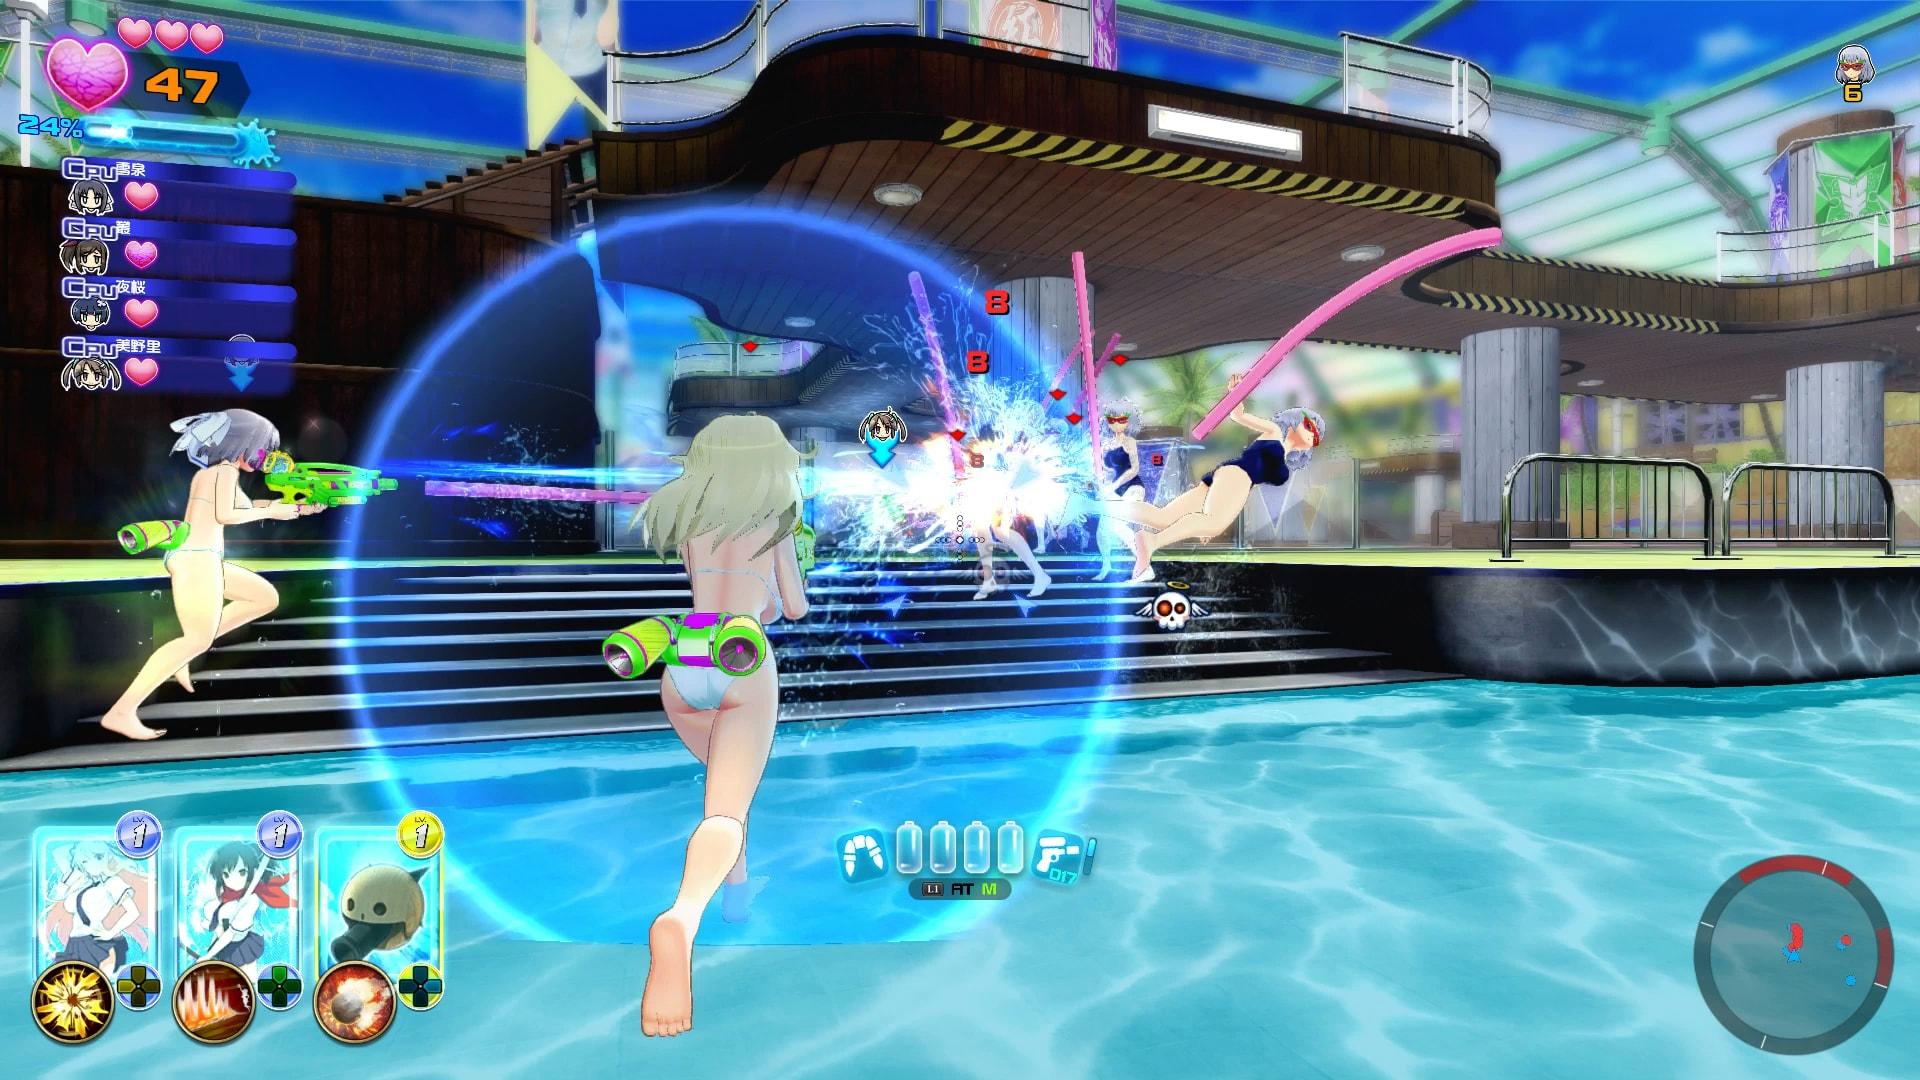 Spin-off Senran Kagura Peach Beach Splash už letos v létě! 141384